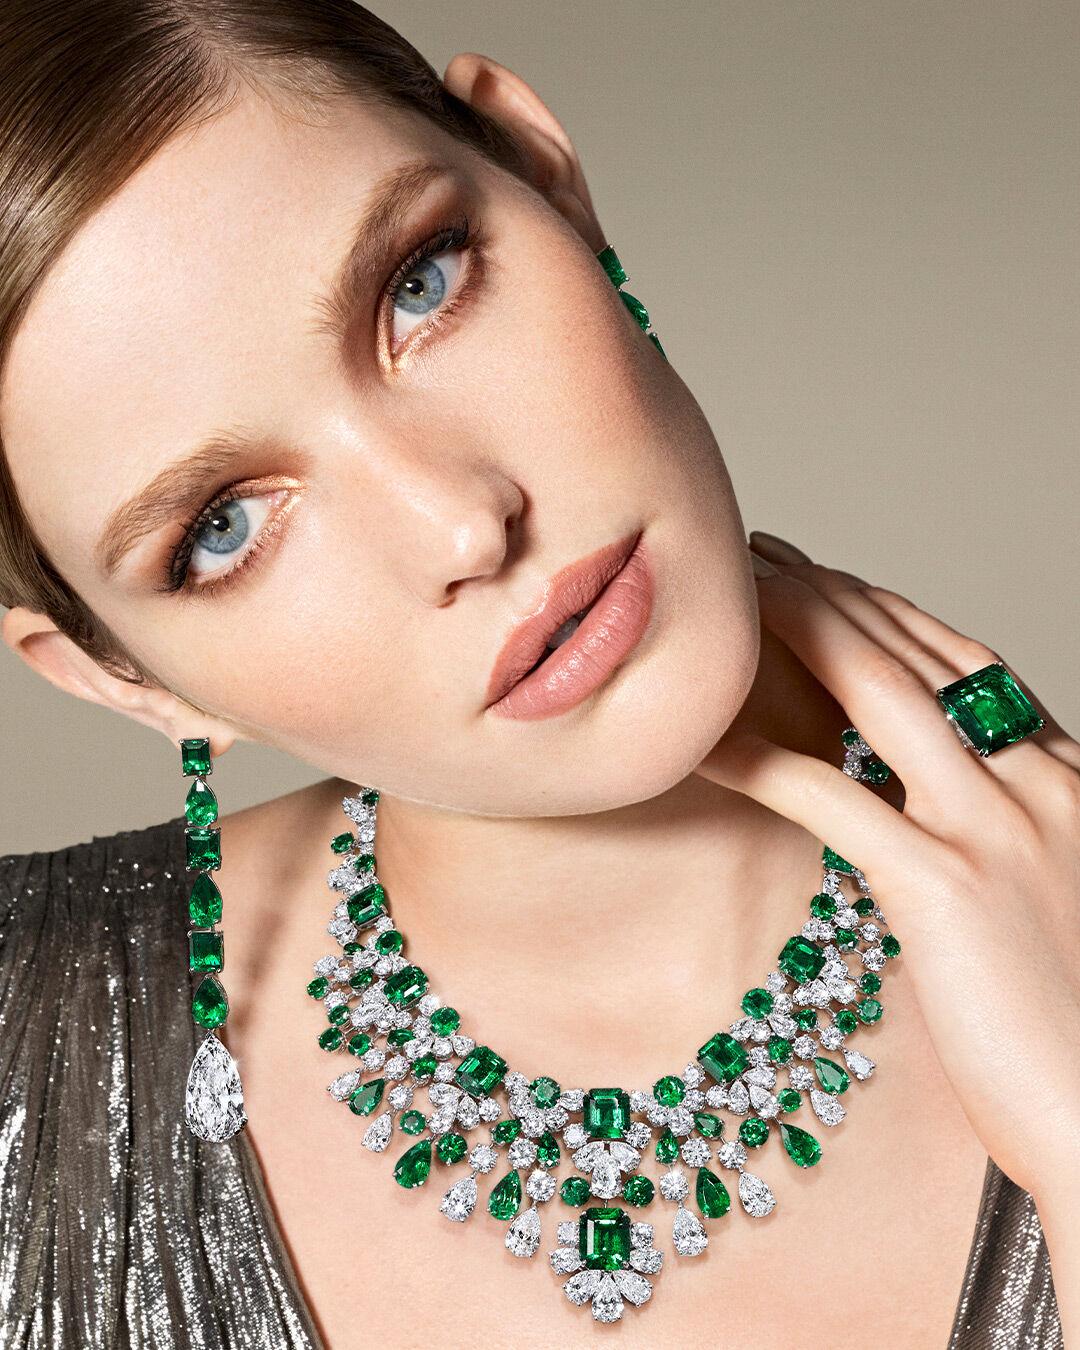 Model wars Graff emerald and white diamond high jewellery